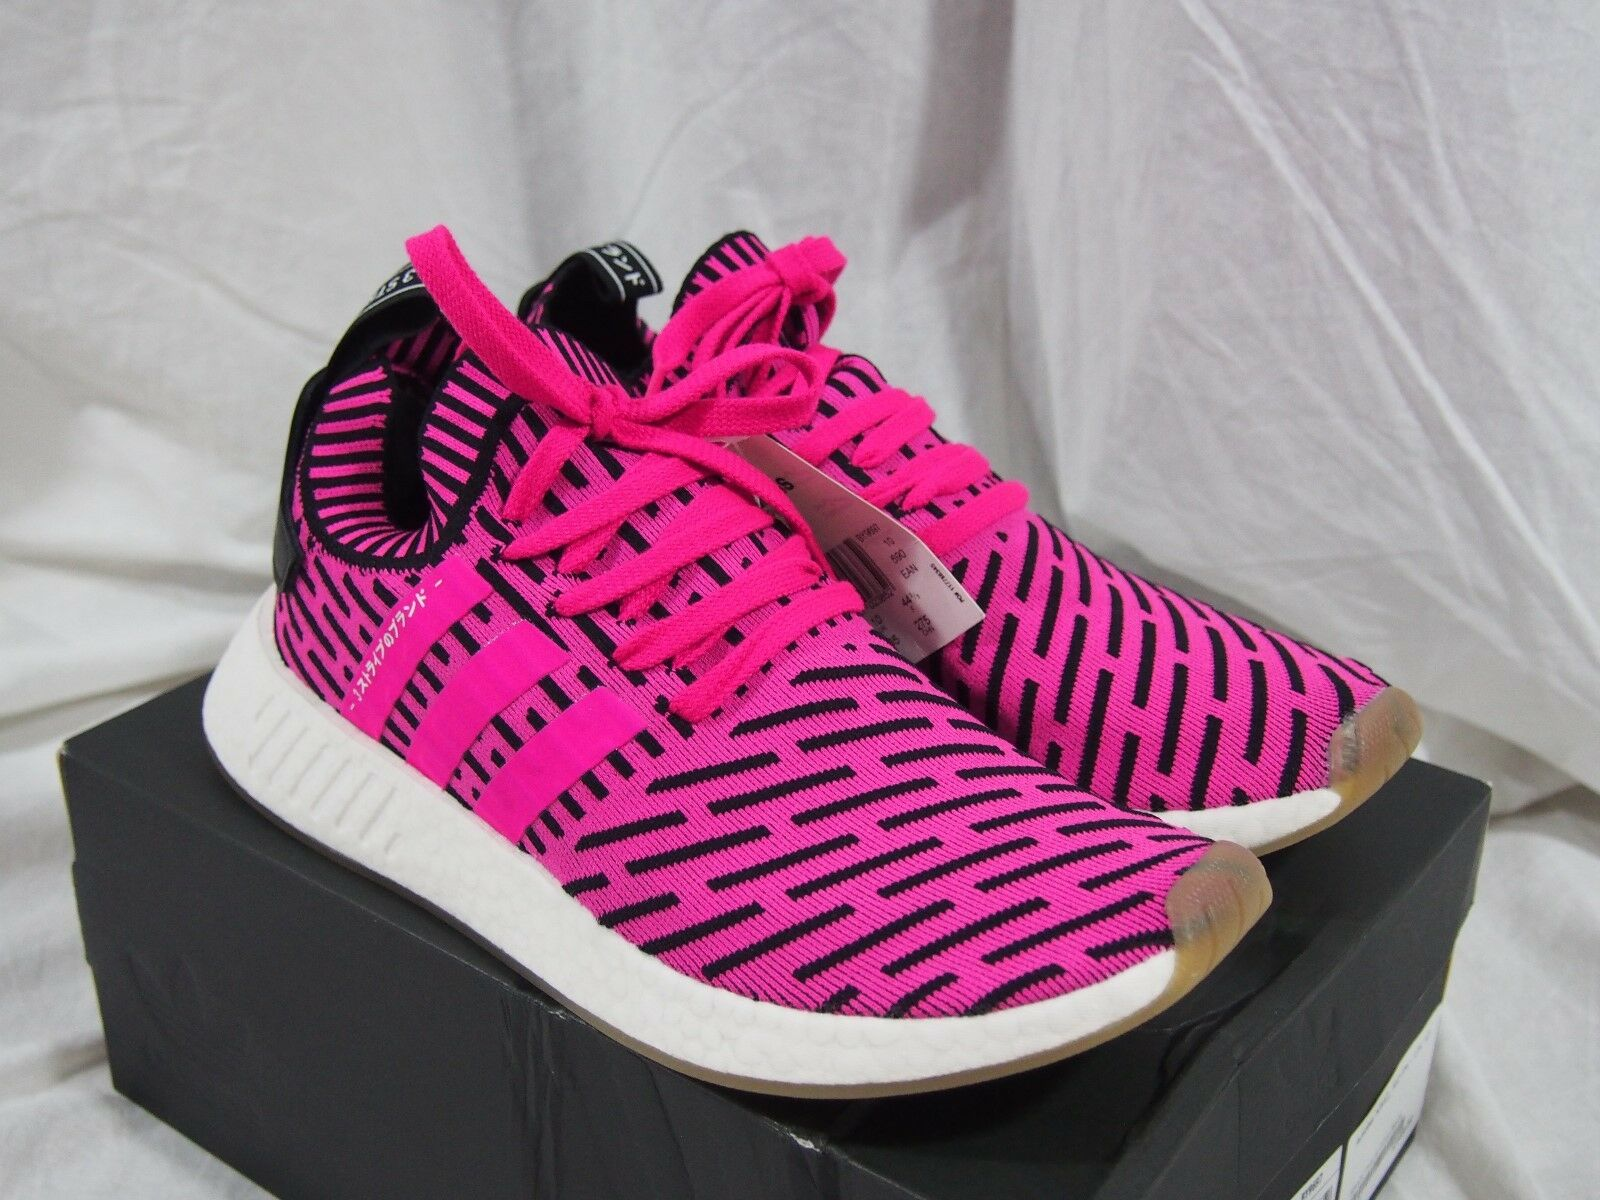 Adidas NMD R2 Primeknit Japan Shock Pink BY9697